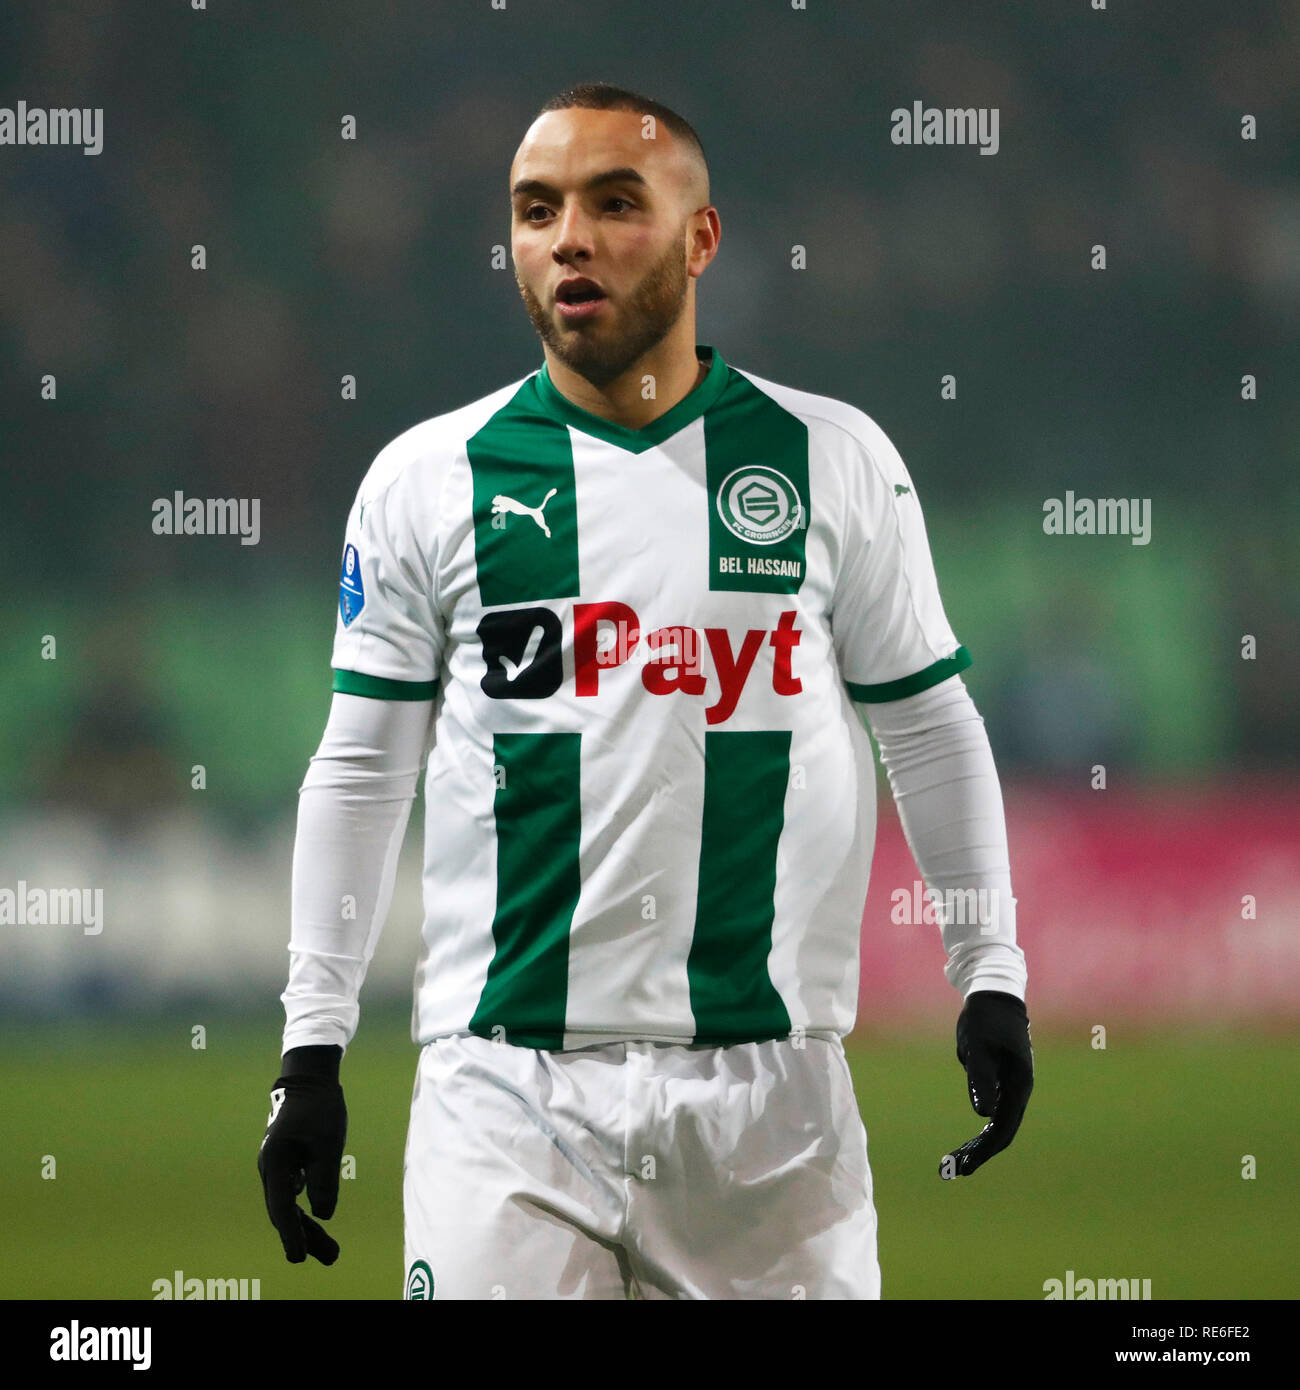 Iliass Bel Hassani.Groningen 19 01 2019 Euroborg Dutch Eredivisie Season